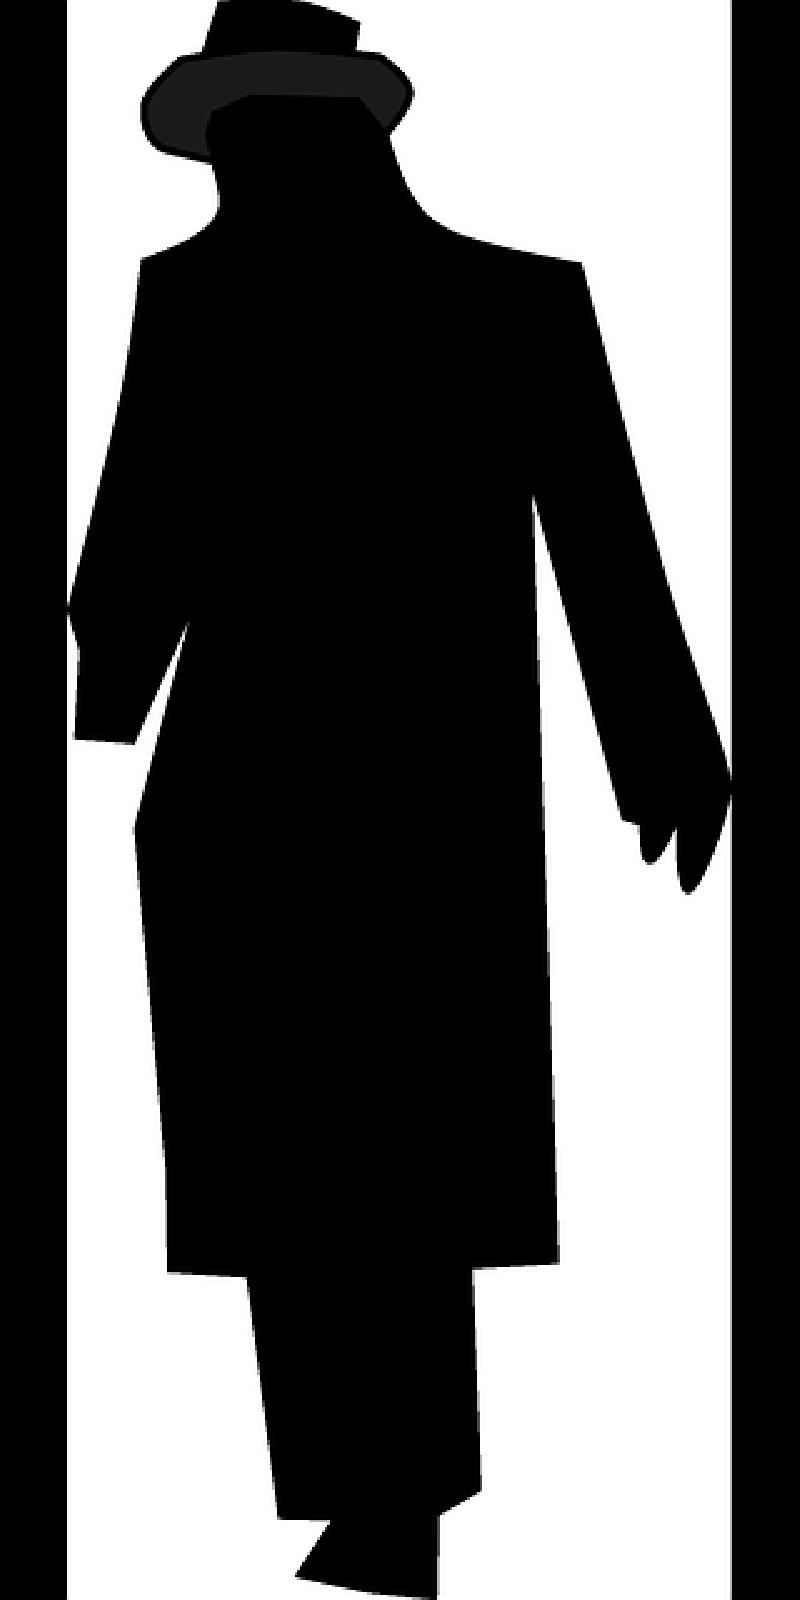 800x1600 Top, Man, Silhouette, Person, Hat, Night, Walking